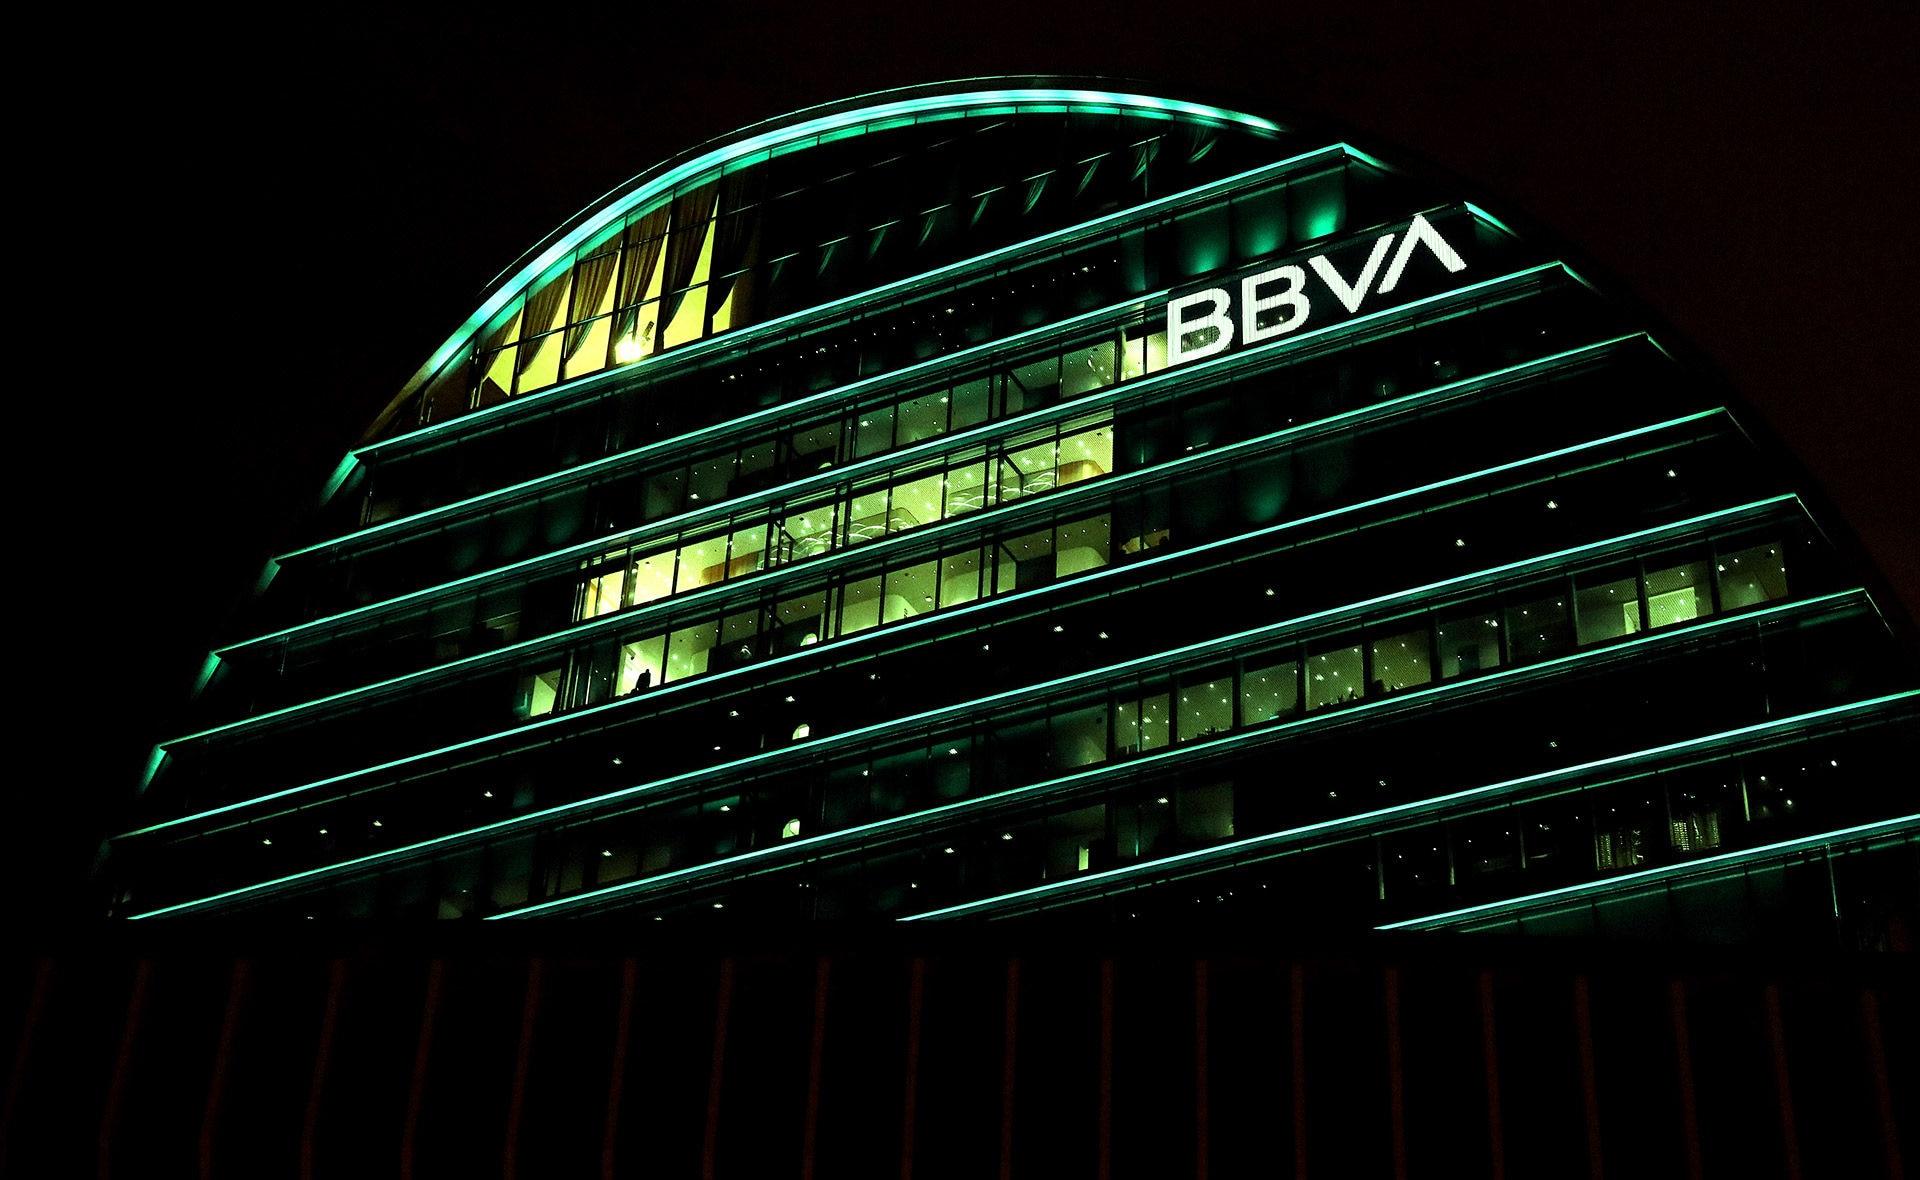 BBVA-premio-capital-finance-internacional-sostenibilidad-03082020